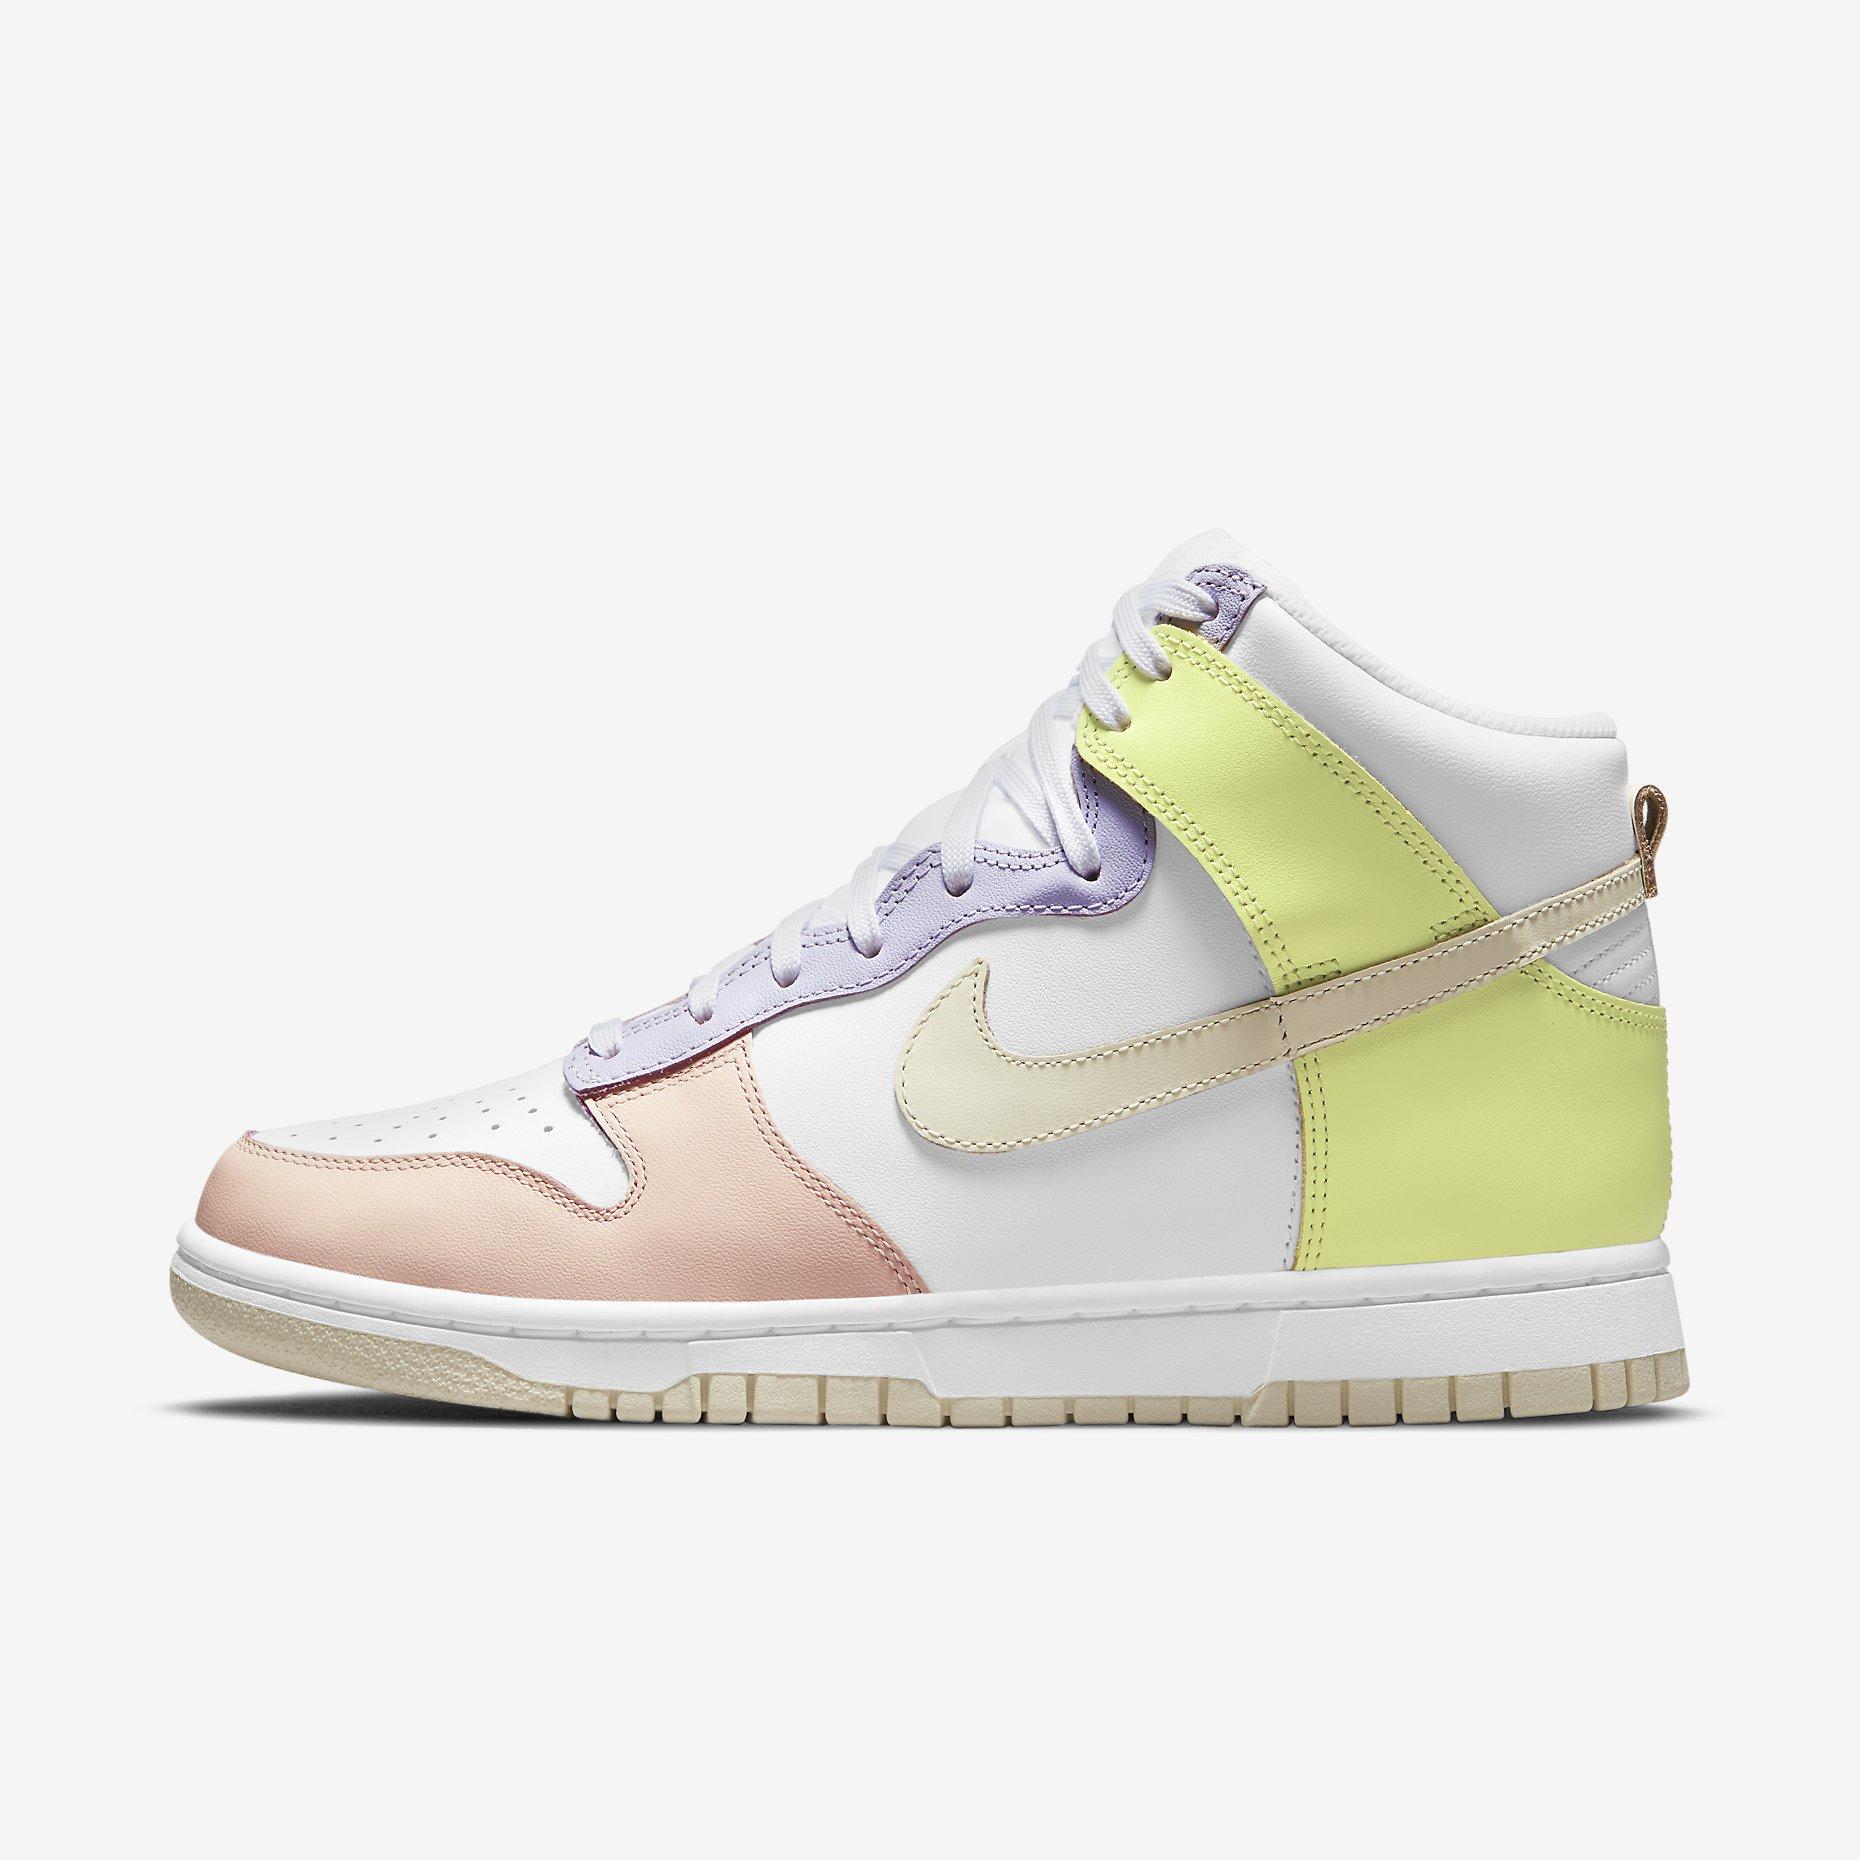 Women's Nike Dunk High 'Lemon Twist'